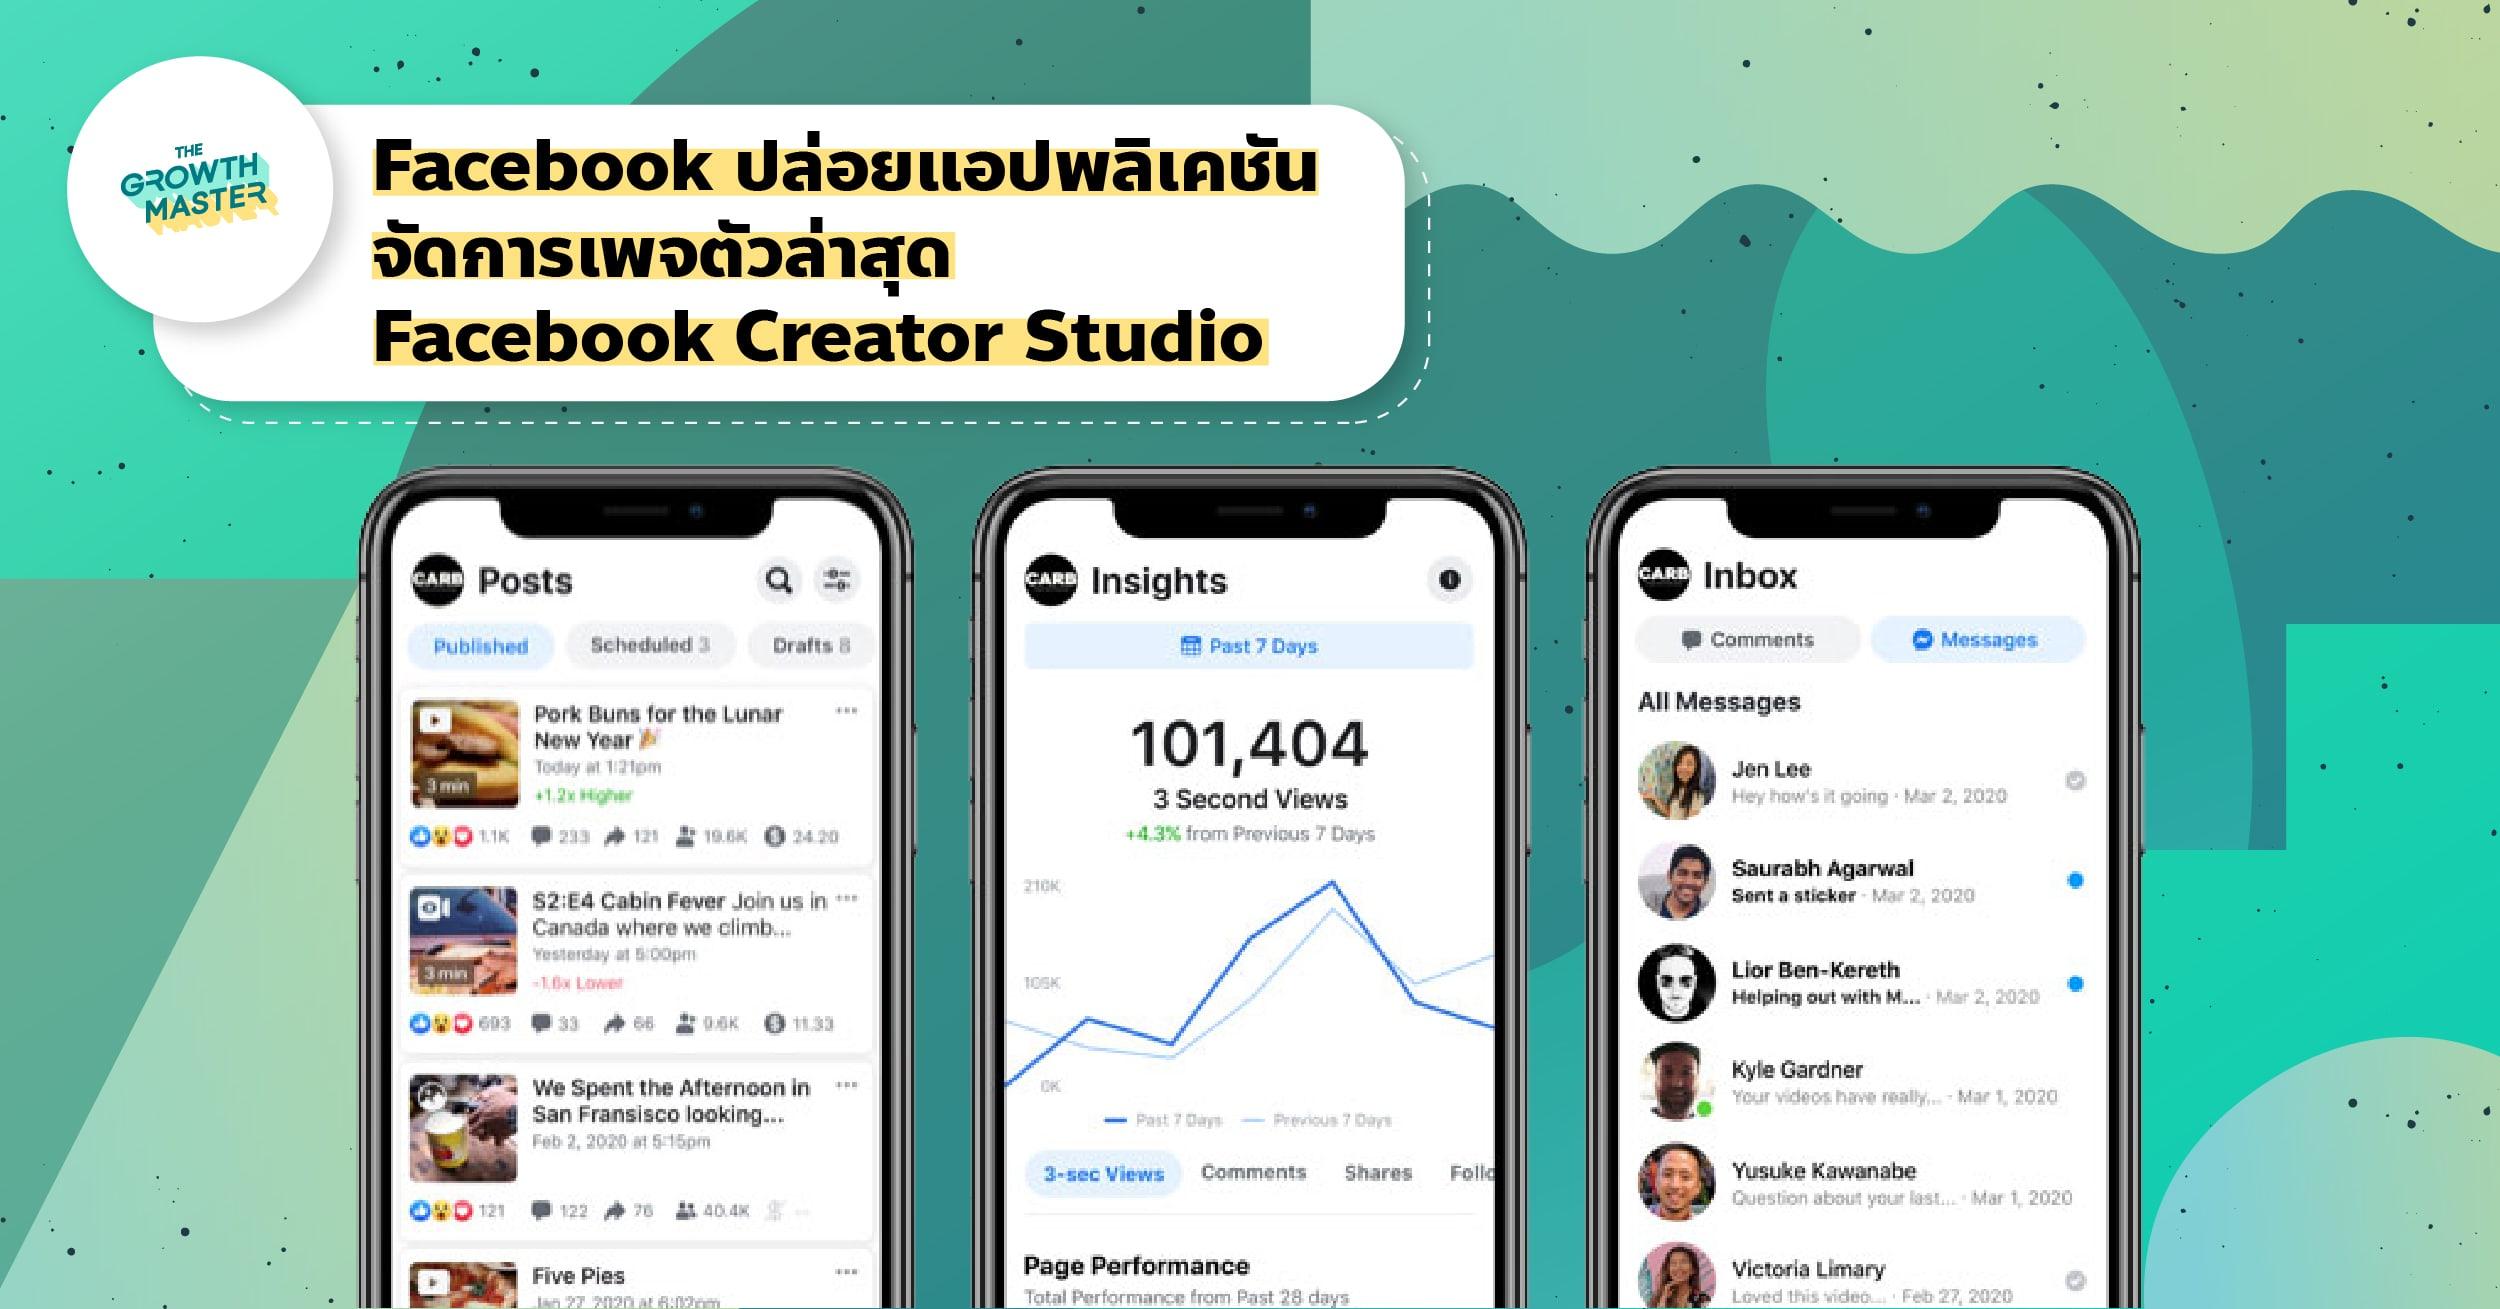 Facebook ปล่อยแอปพลิเคชั่นจัดการเพจตัวล่าสุด Facebook Creator Studio